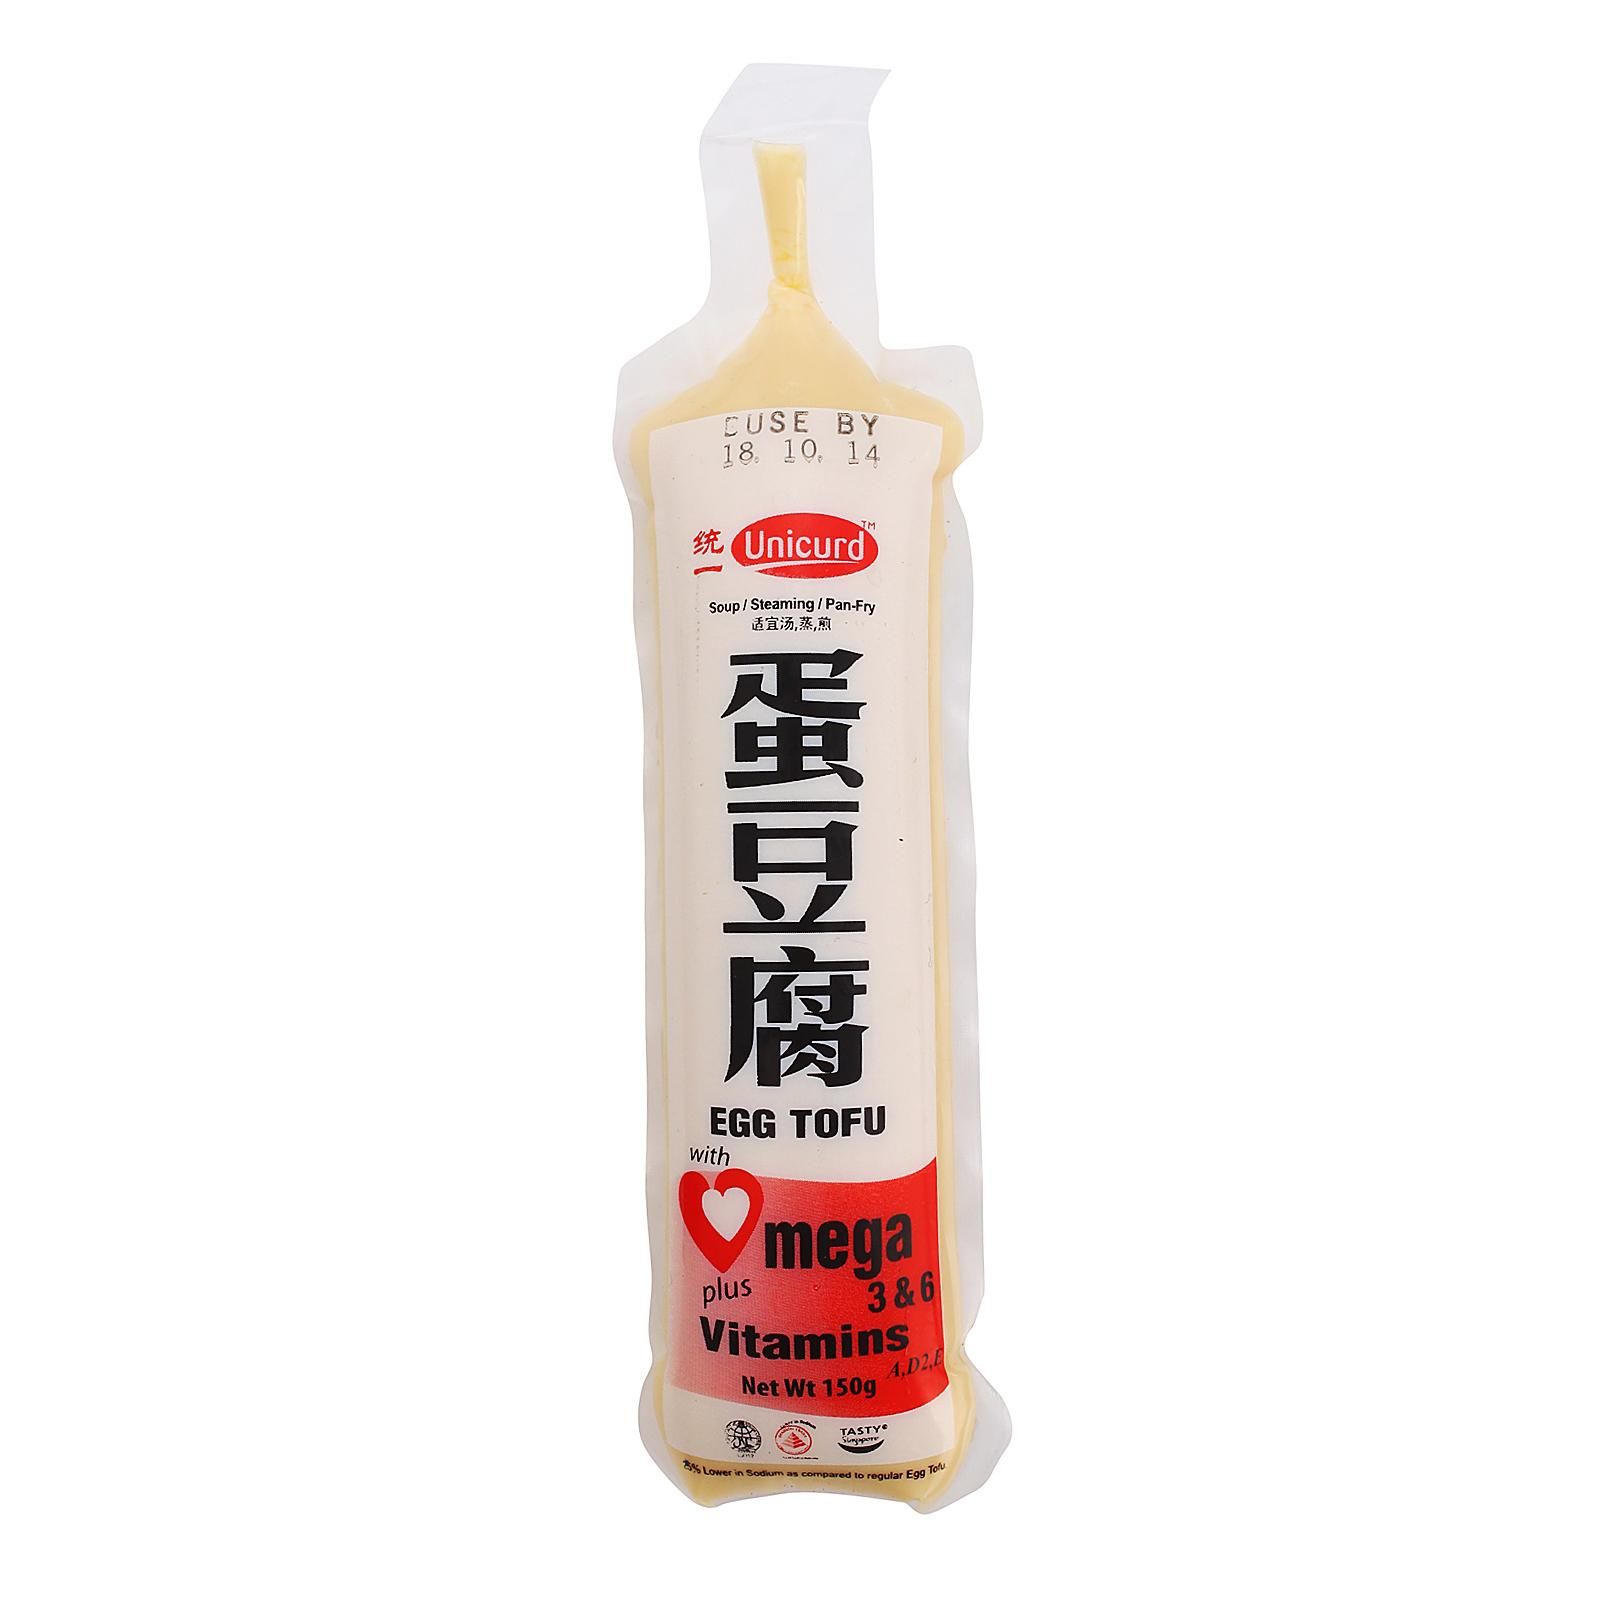 Unicurd Omega Egg Tofu (Tube)